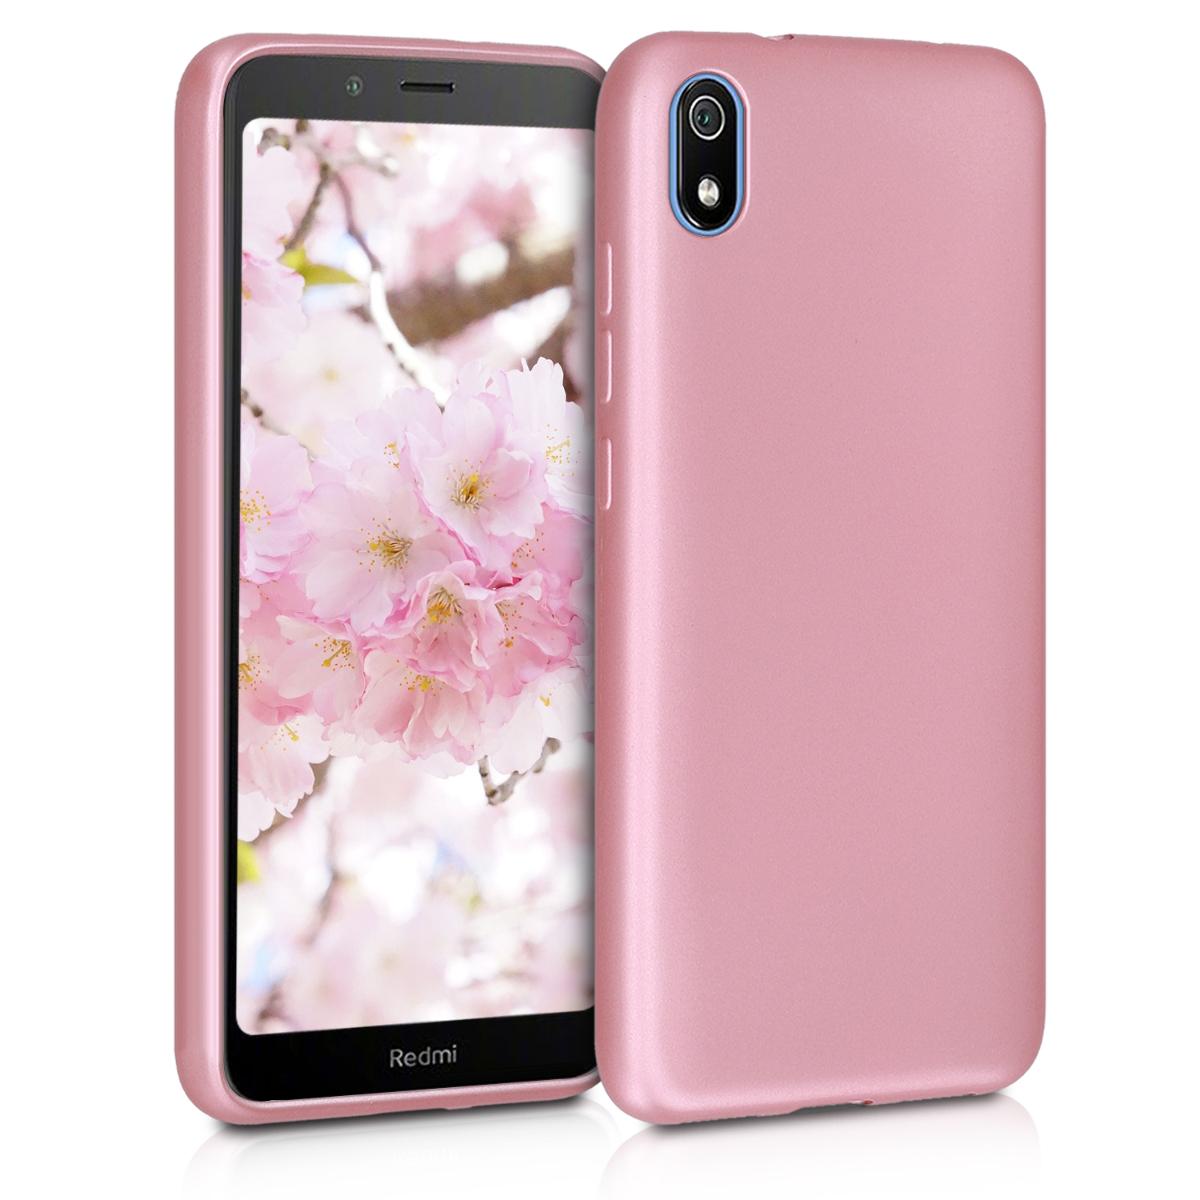 Kvalitní silikonové TPU pouzdro | obal pro Xiaomi Redmi 7A - metalické starorůžový růžovýgold